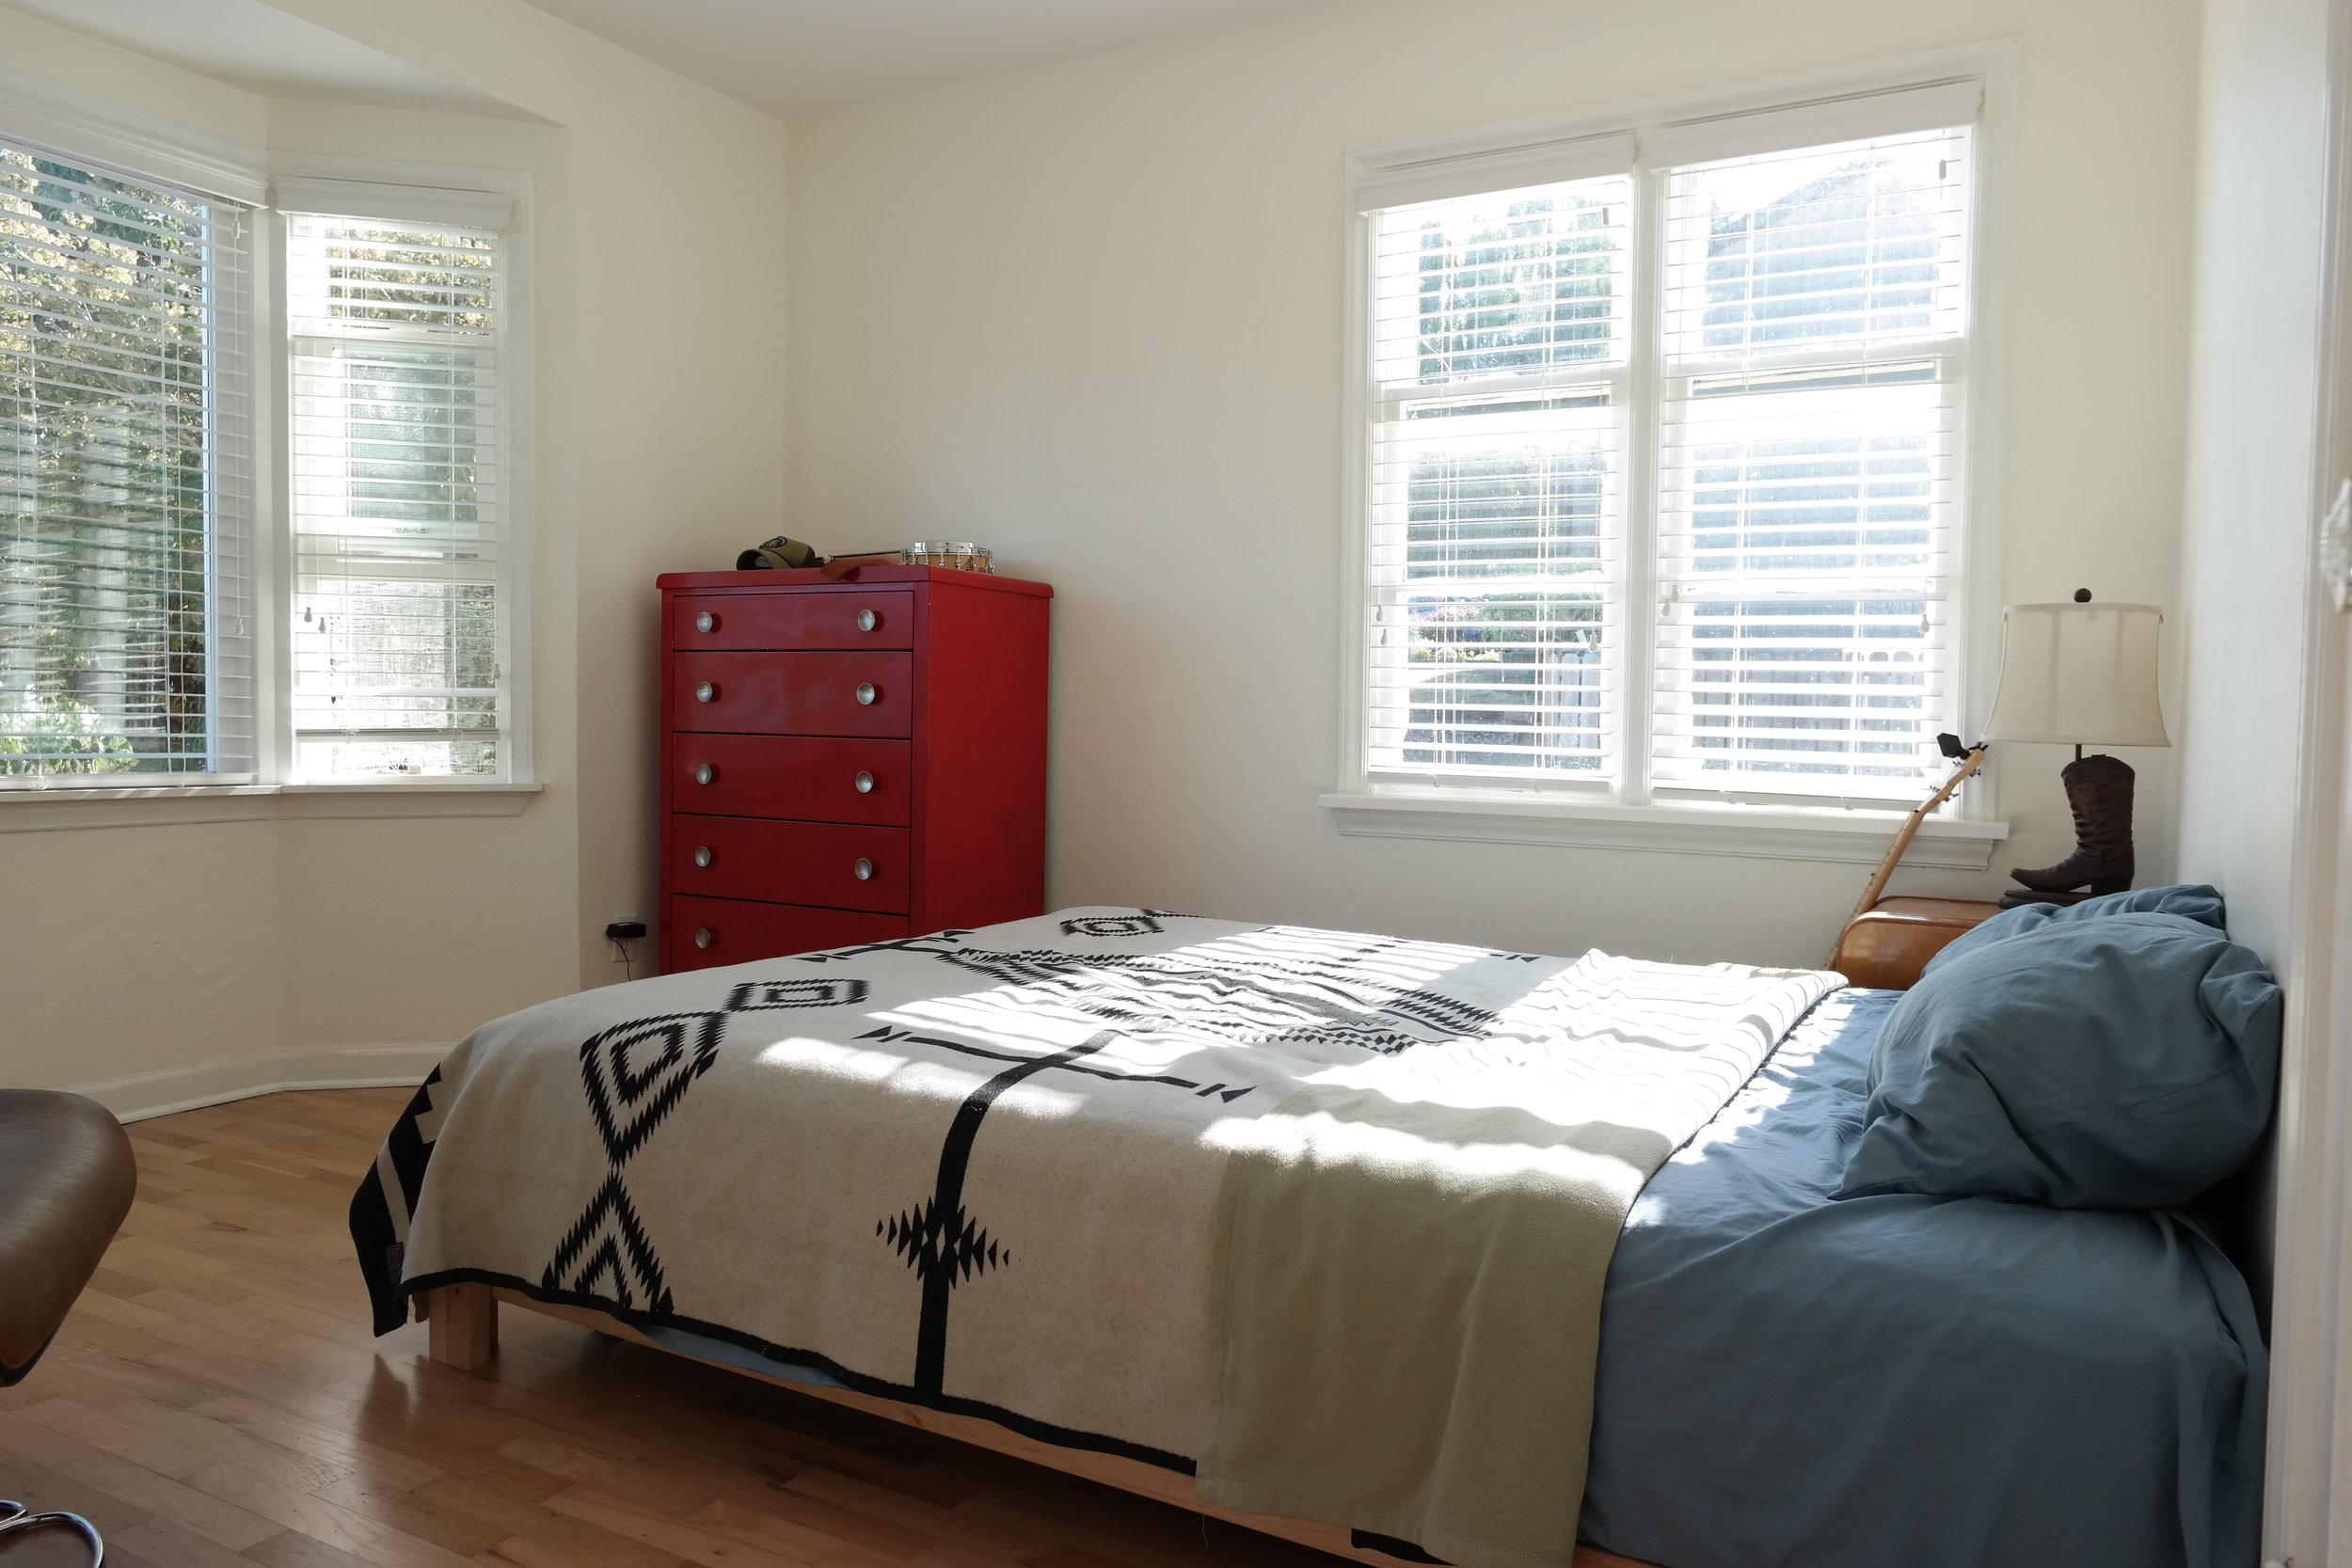 06-Bedroom107.JPG